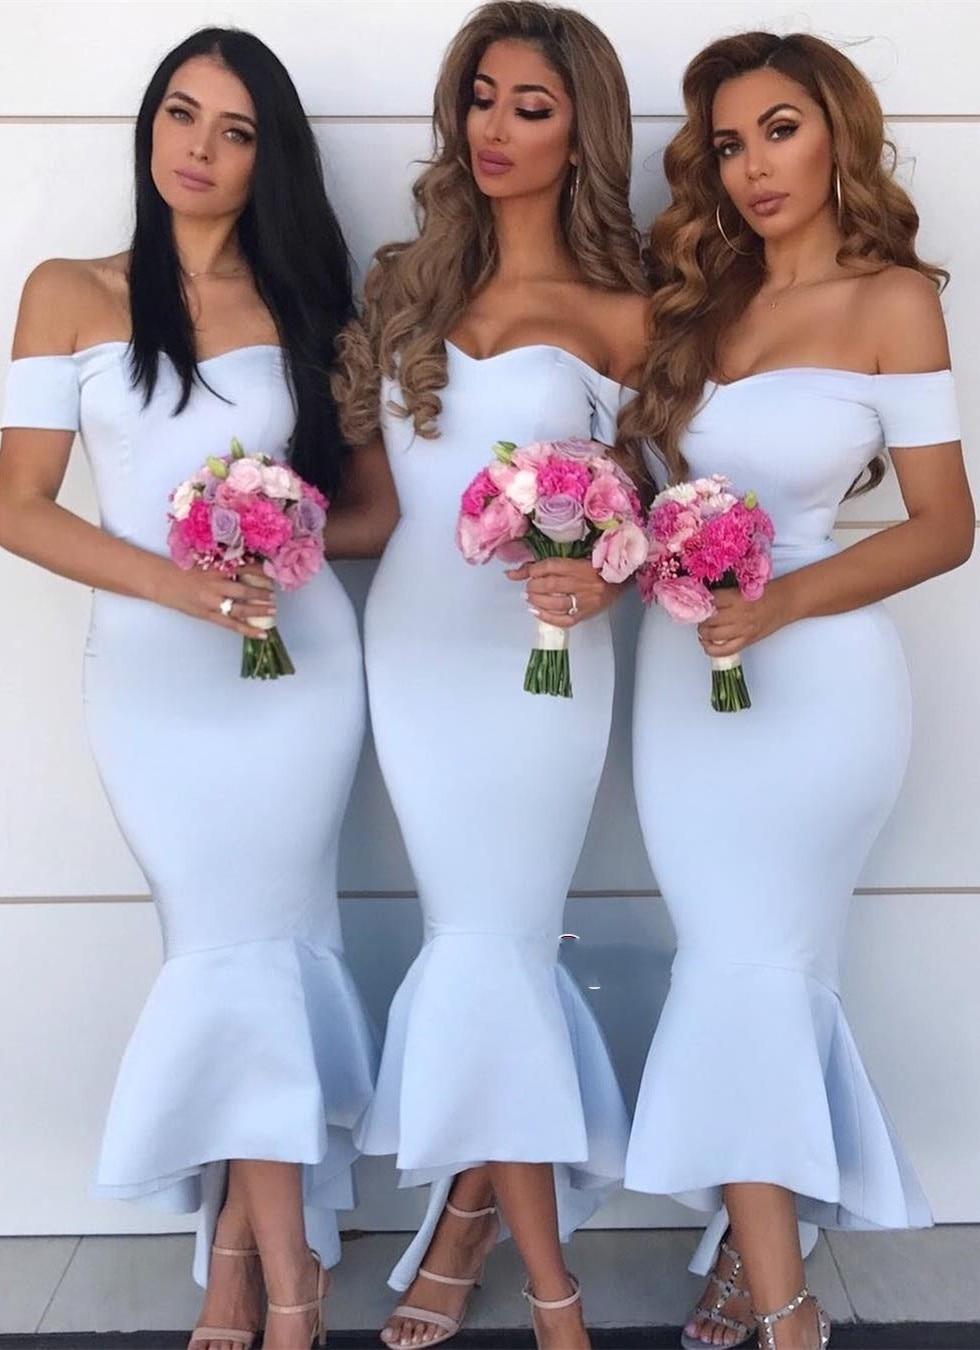 New Elegant Mermaid Bridesmaid Dress 2019 Off Shoulder Light Blue Wedding Party Gowns Cheap